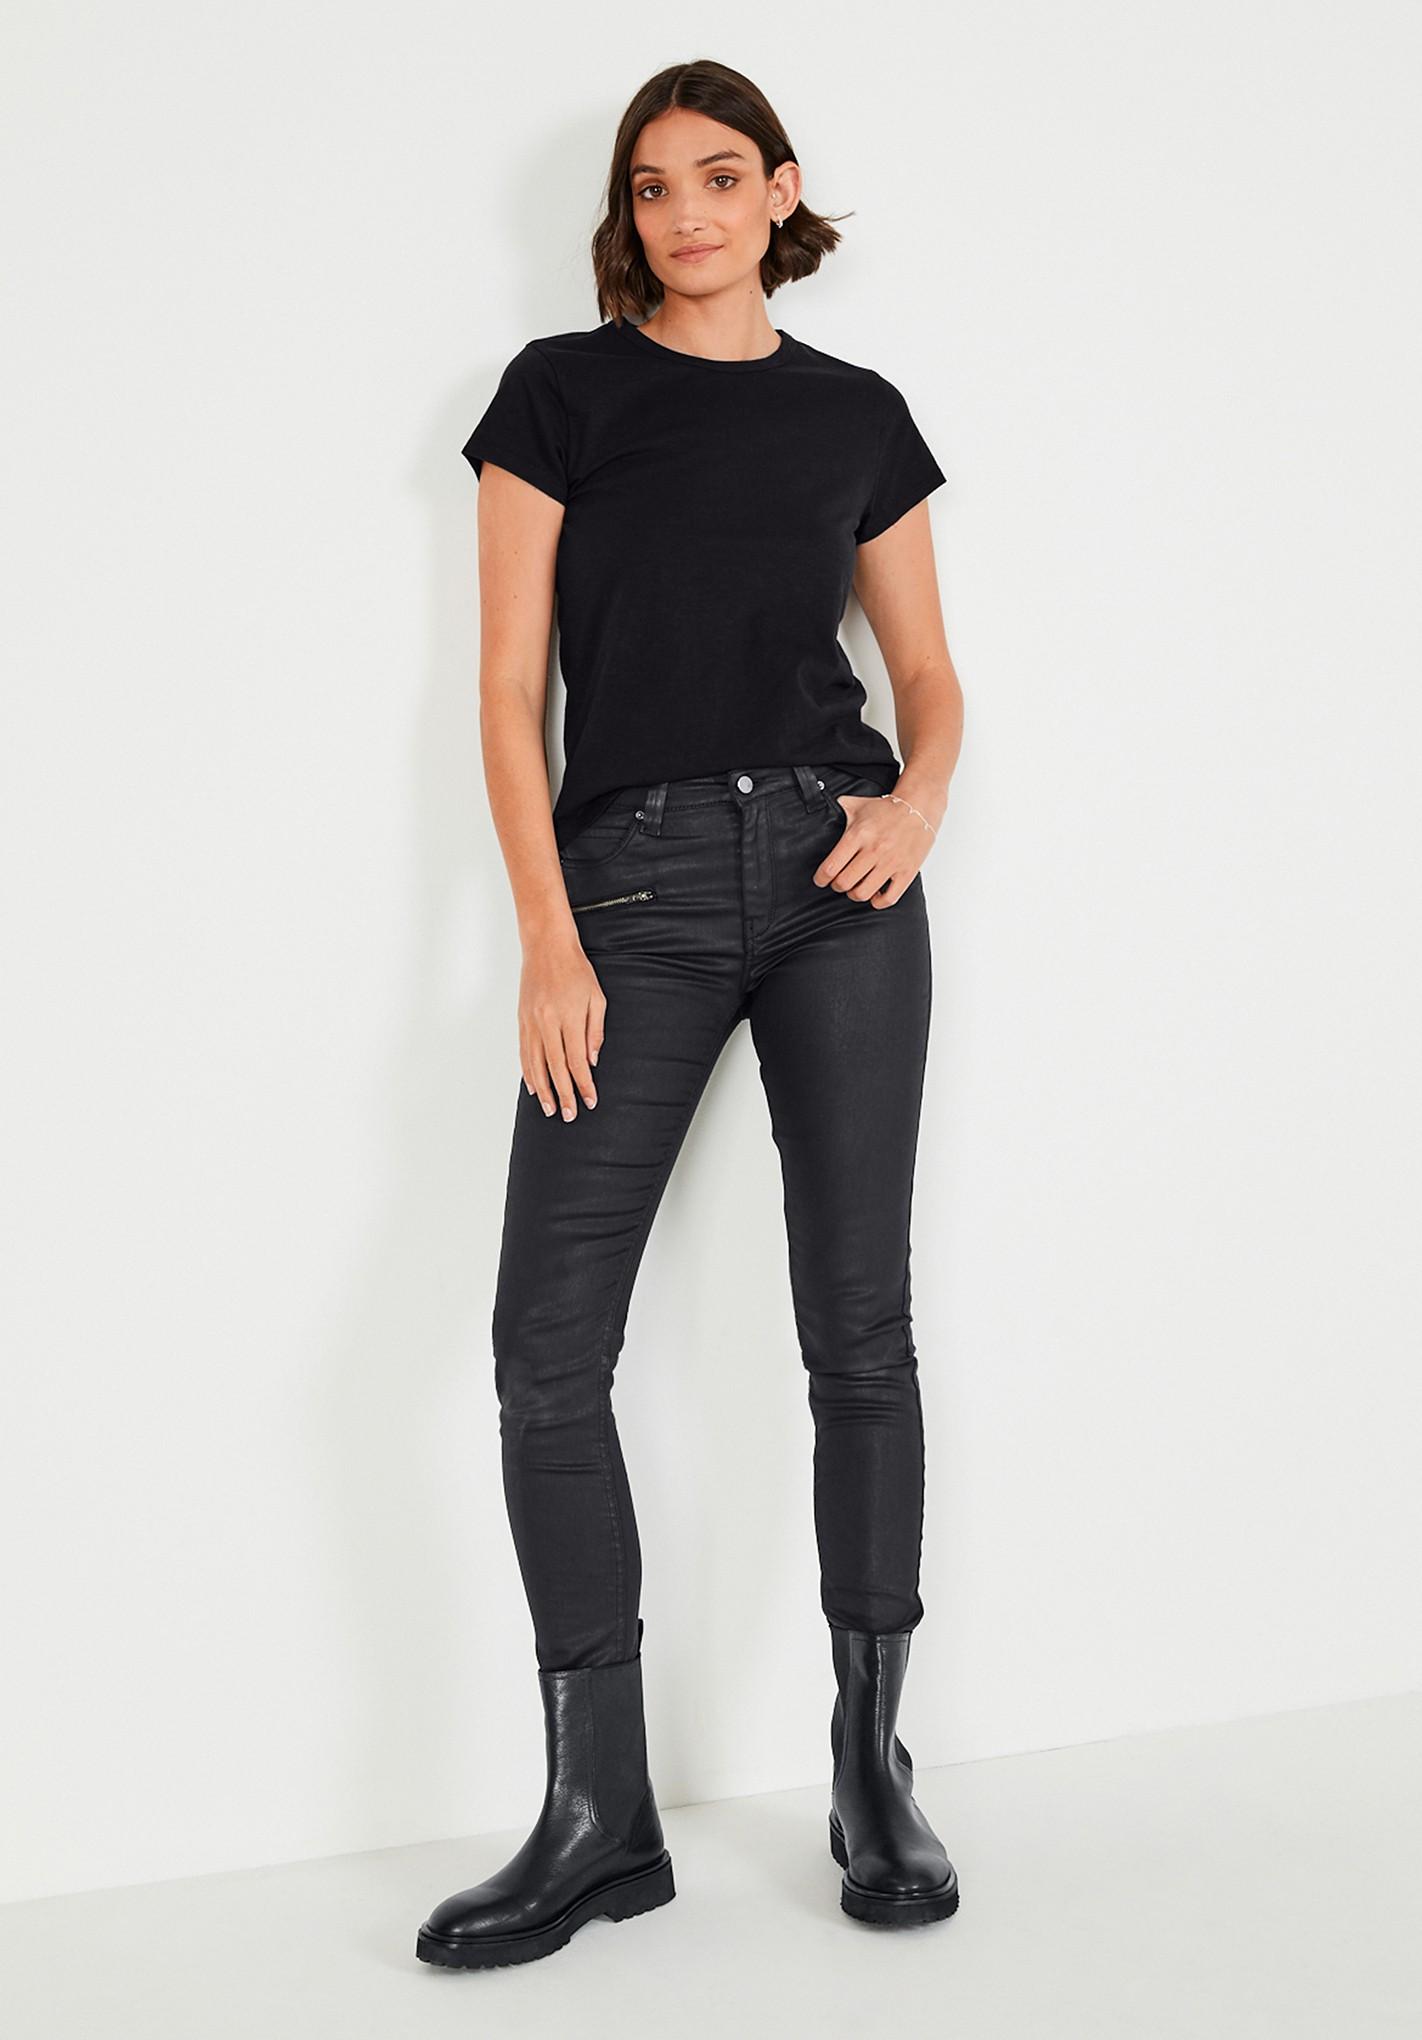 hush black coated jeans black